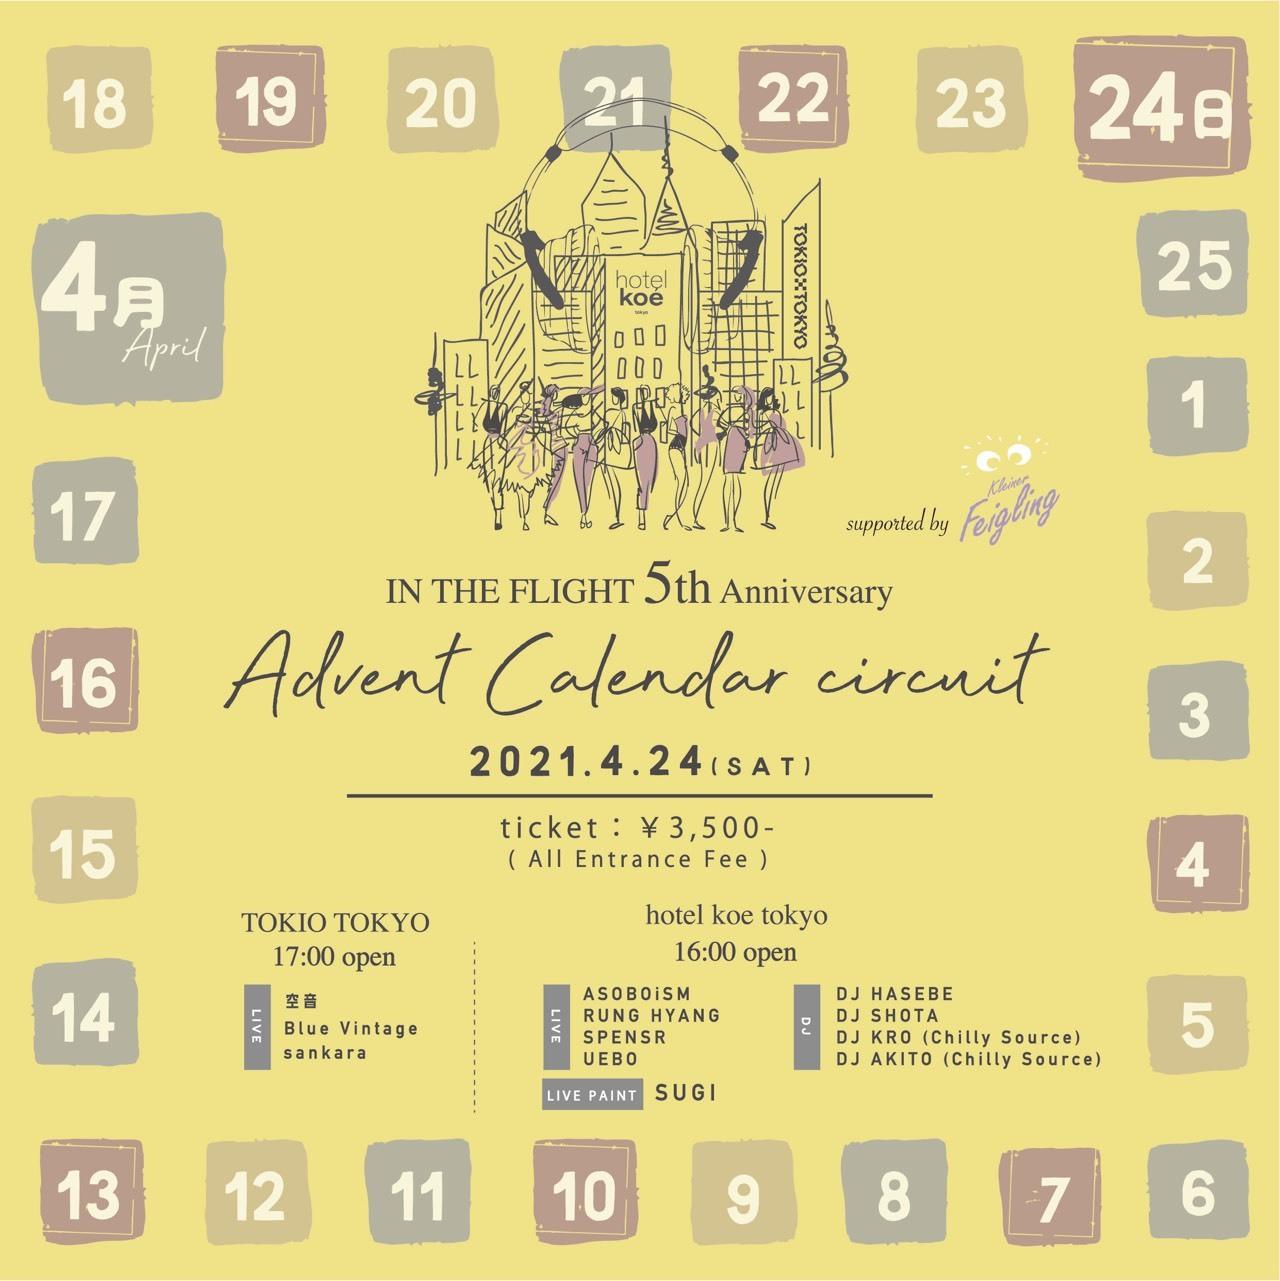 『IN THE FLIGHT 5th Anniversary Advent Calendar circuit』